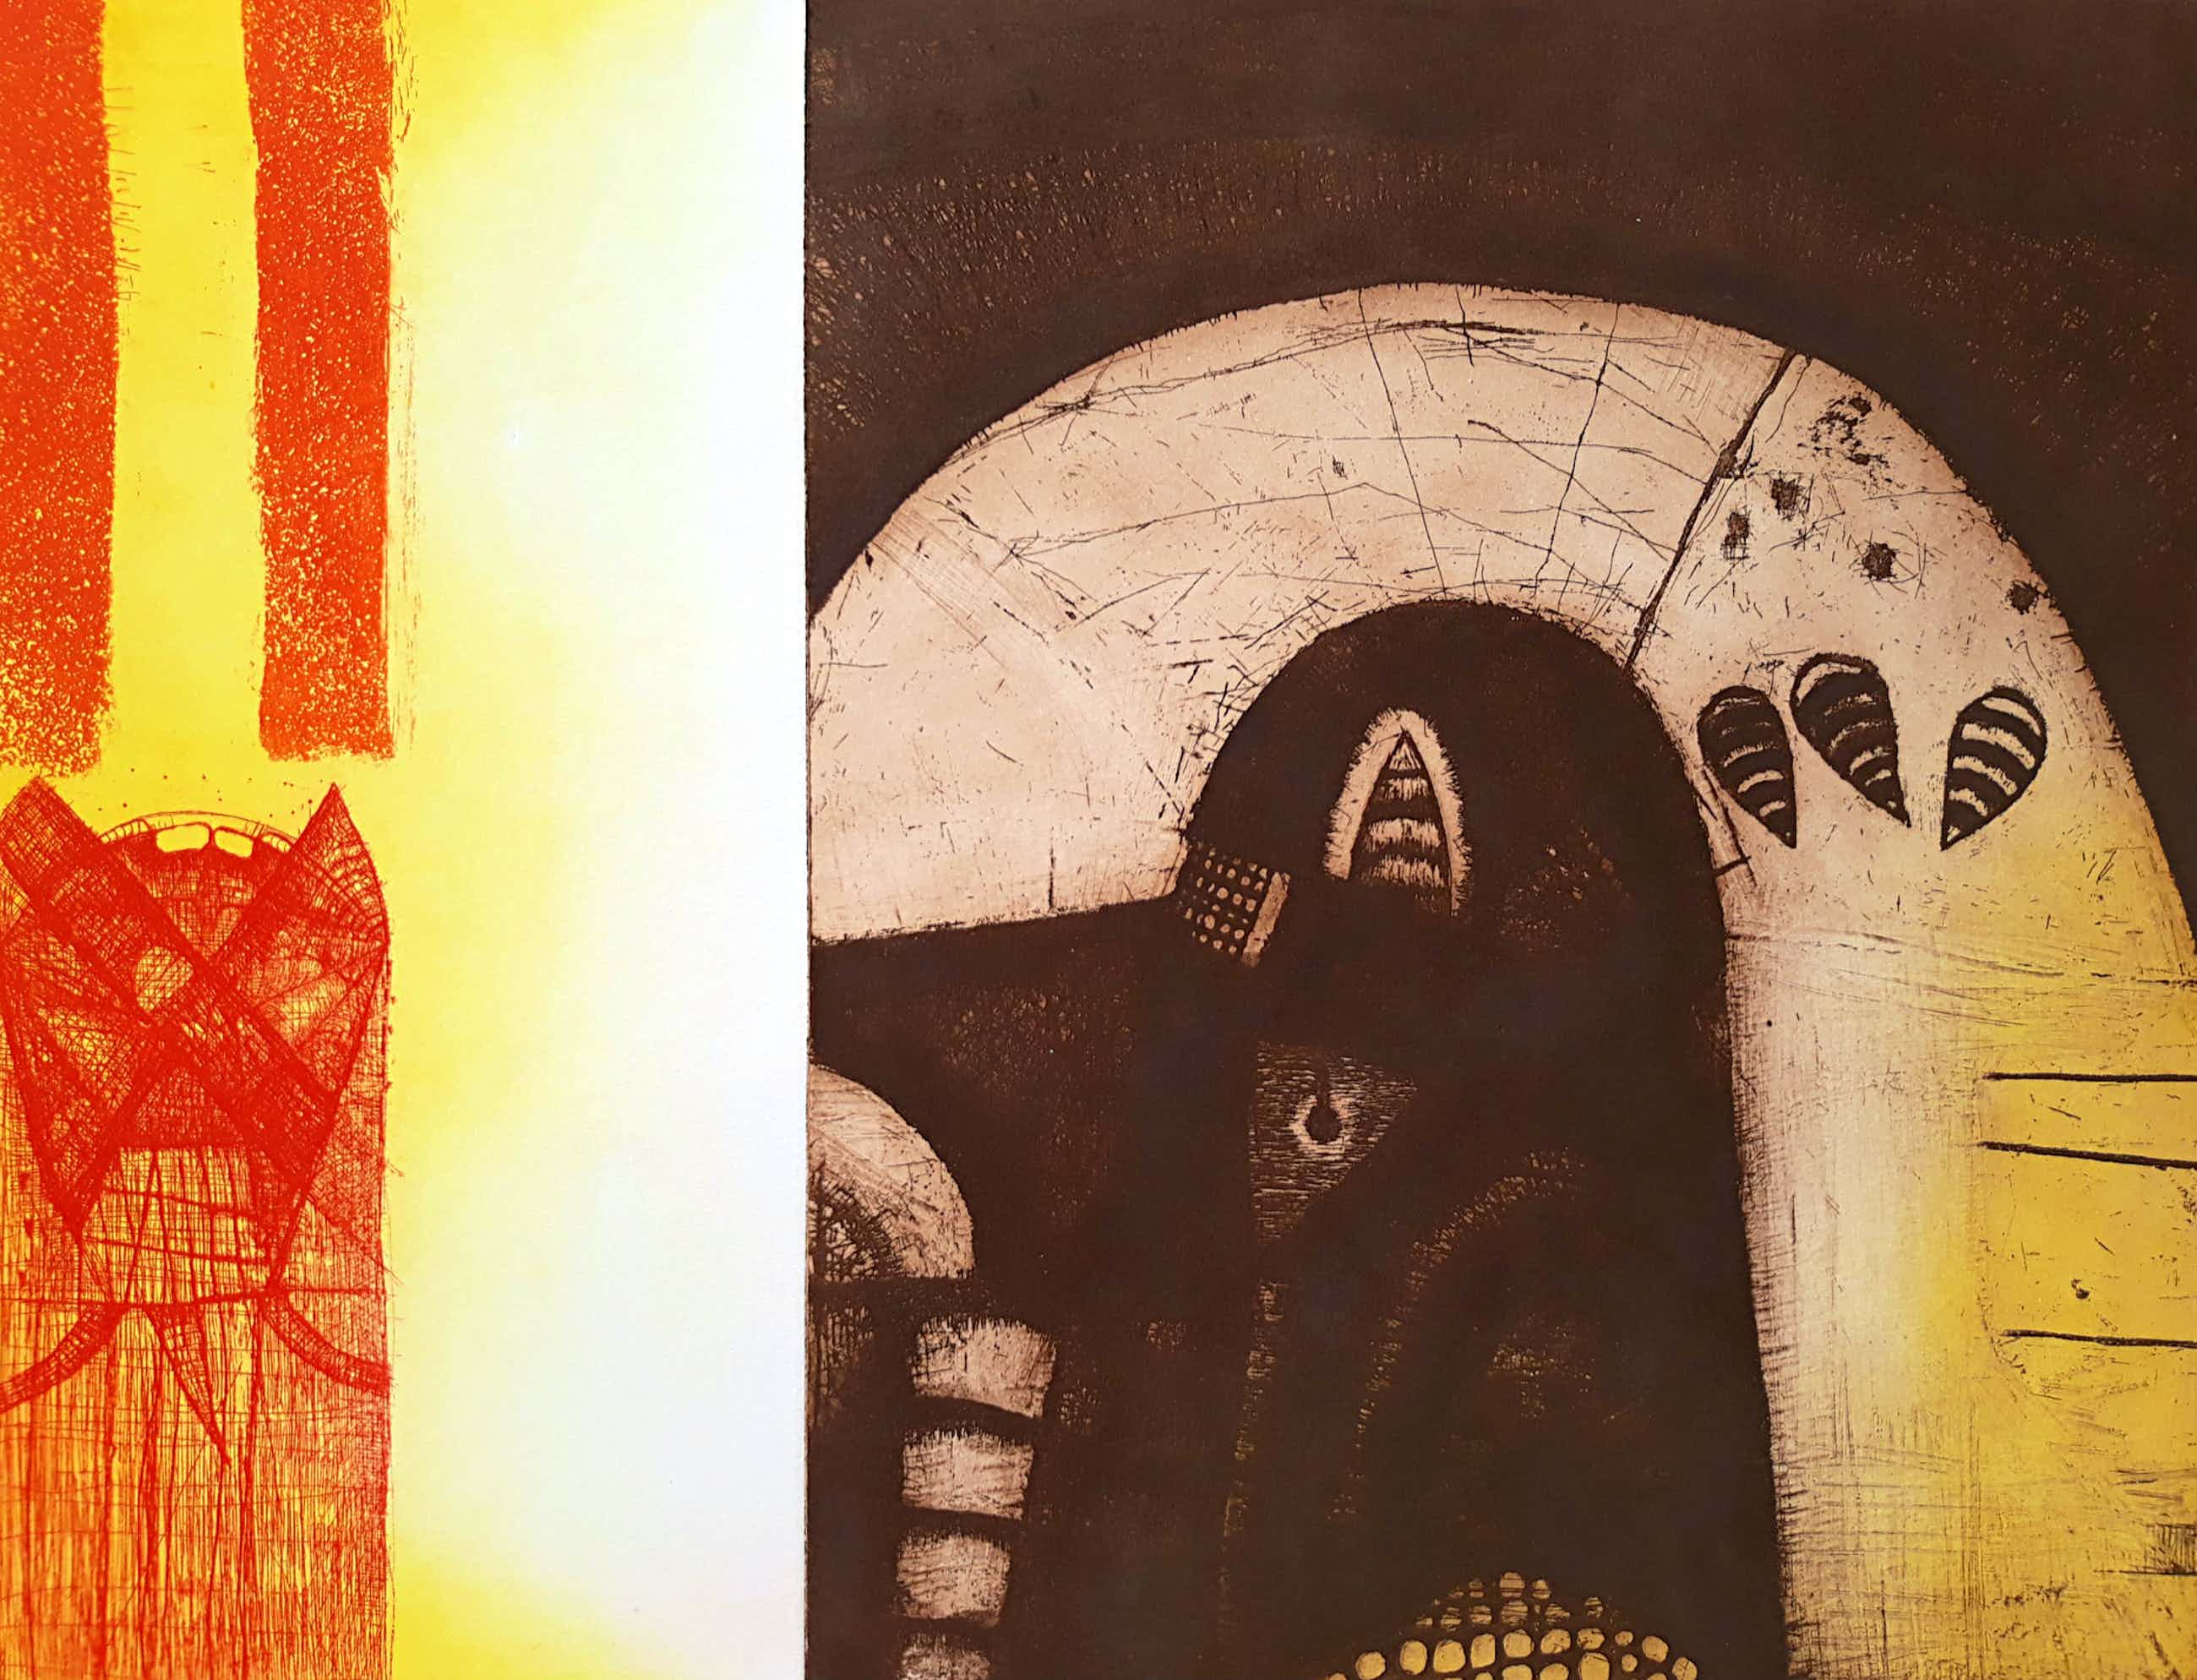 Guillaume Le Roy - Abstracte compositie, aquatint ets kopen? Bied vanaf 60!